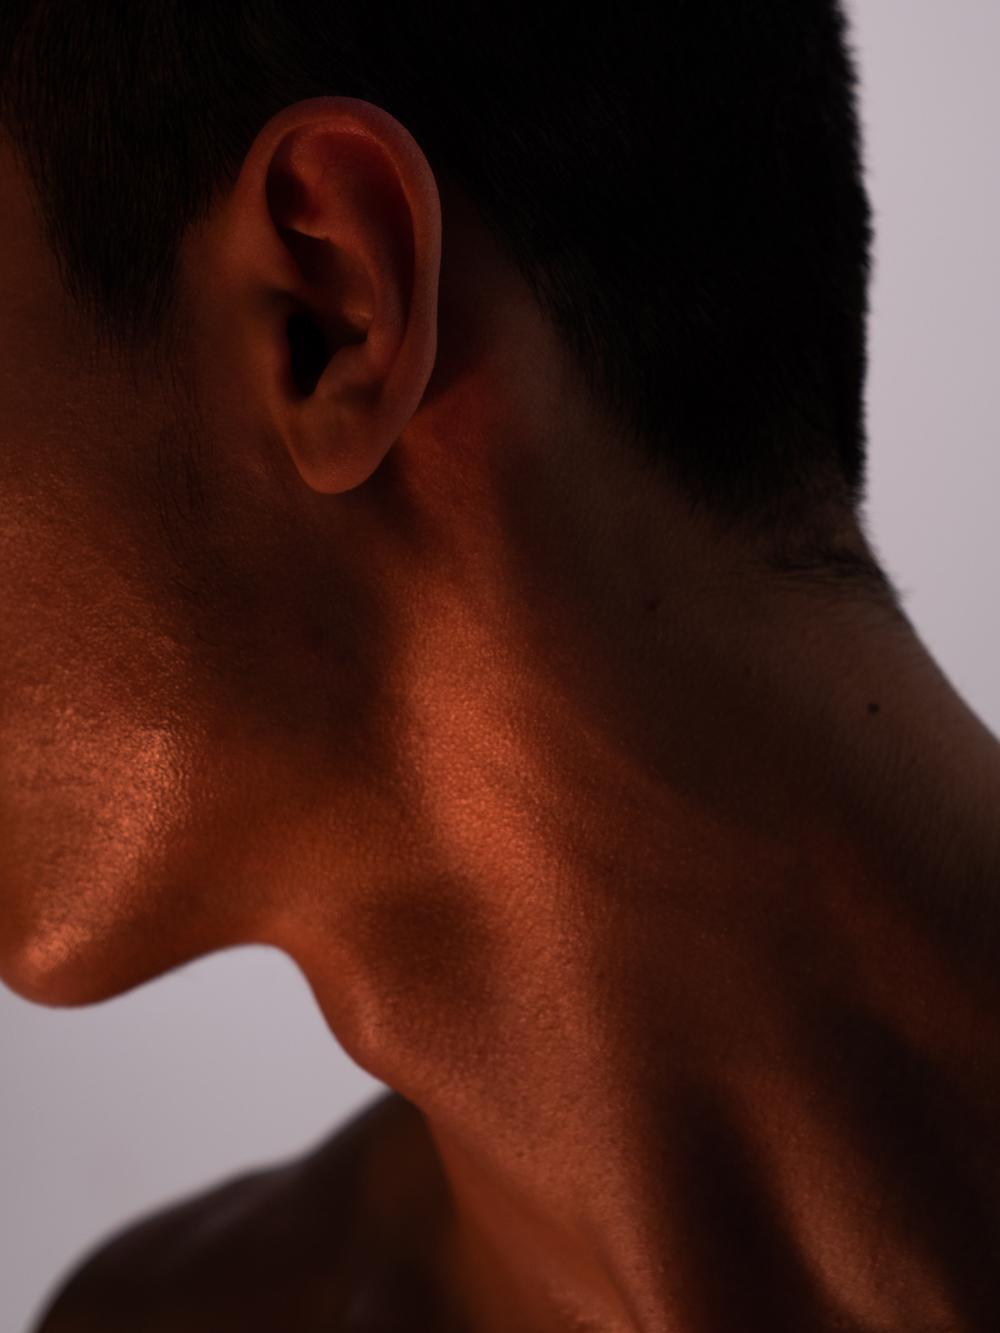 Ближе к телу: специальная съемка Louis Vuitton x BURO. (фото 7)